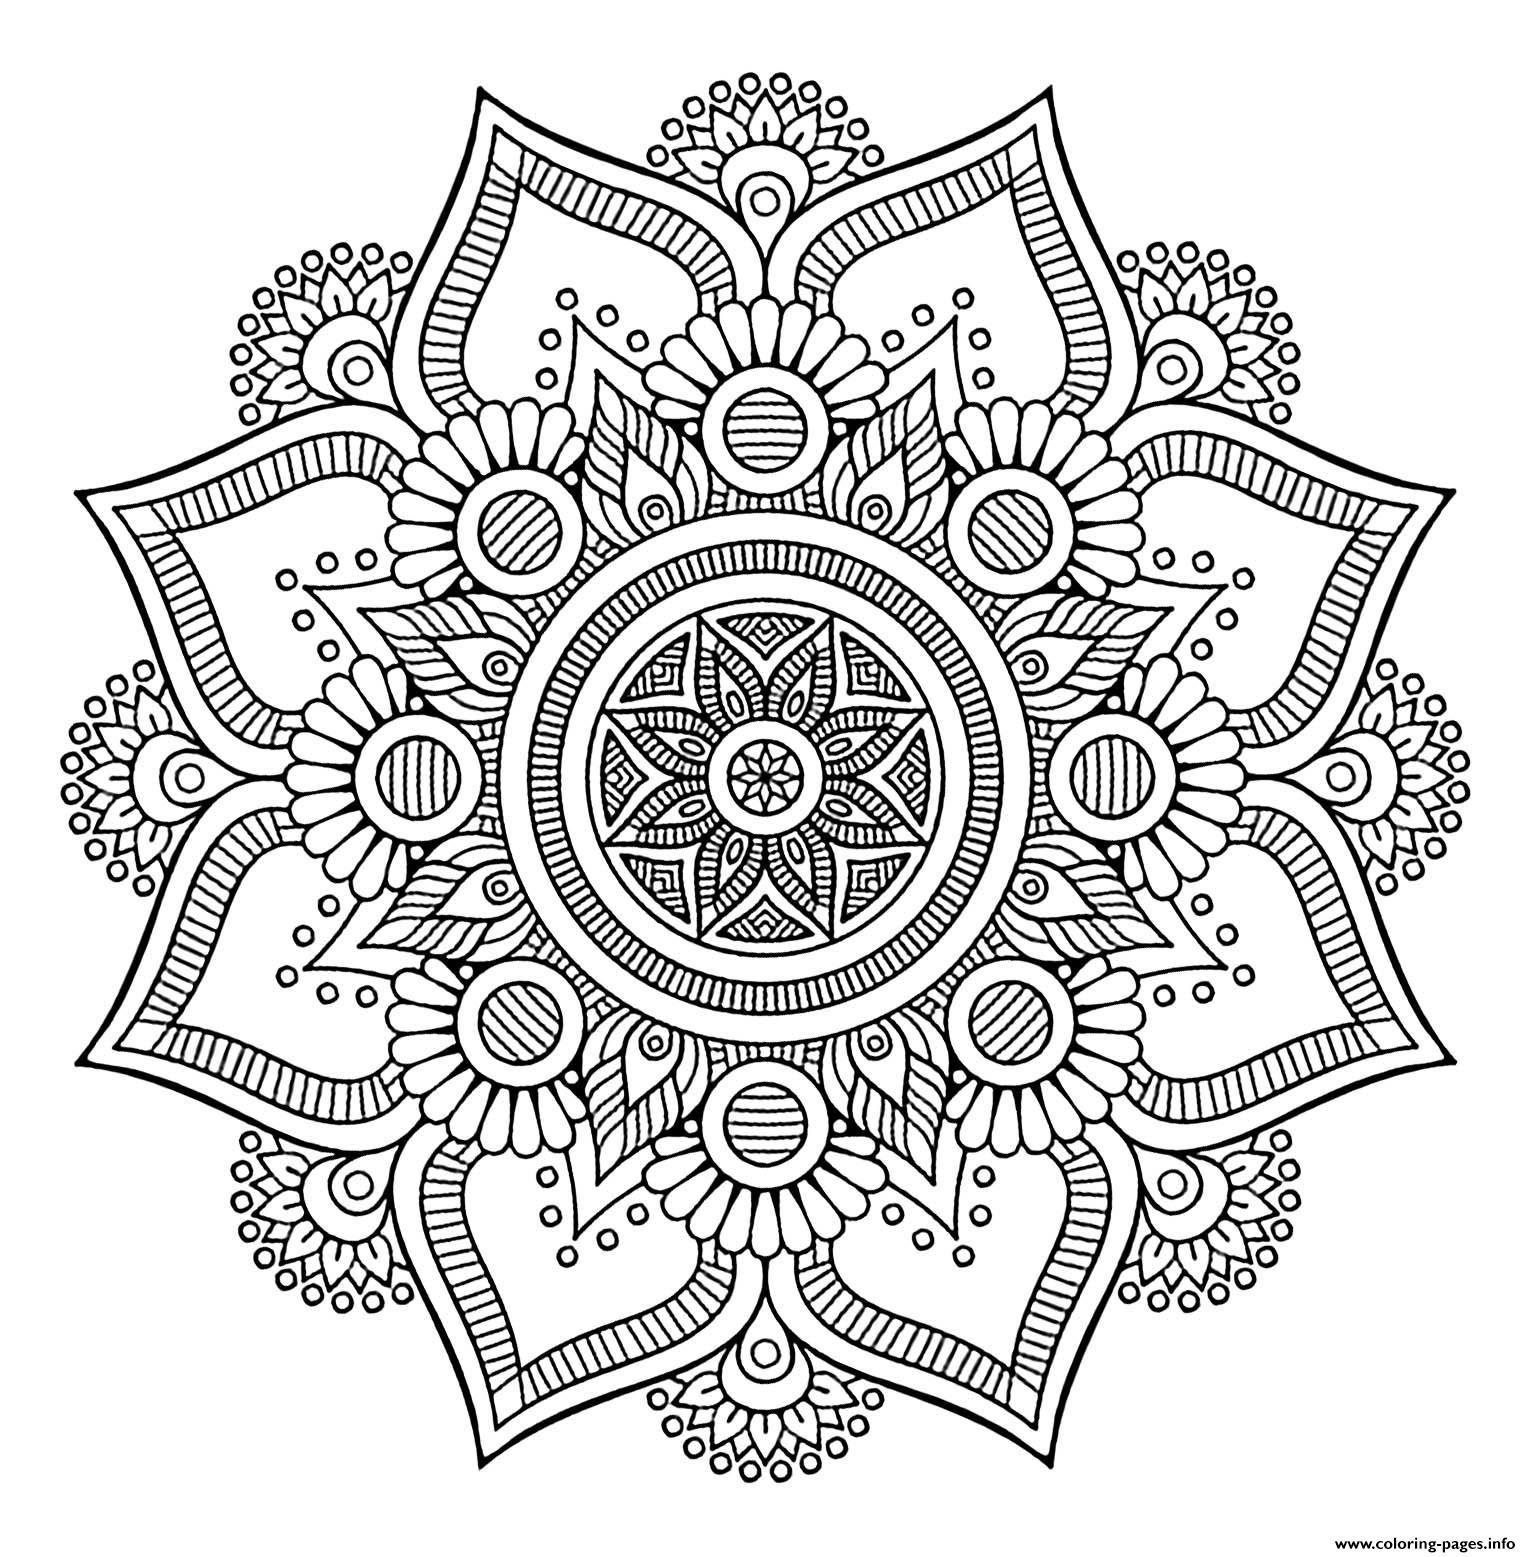 Mandala Big Flower 1 Coloring Pages Printable